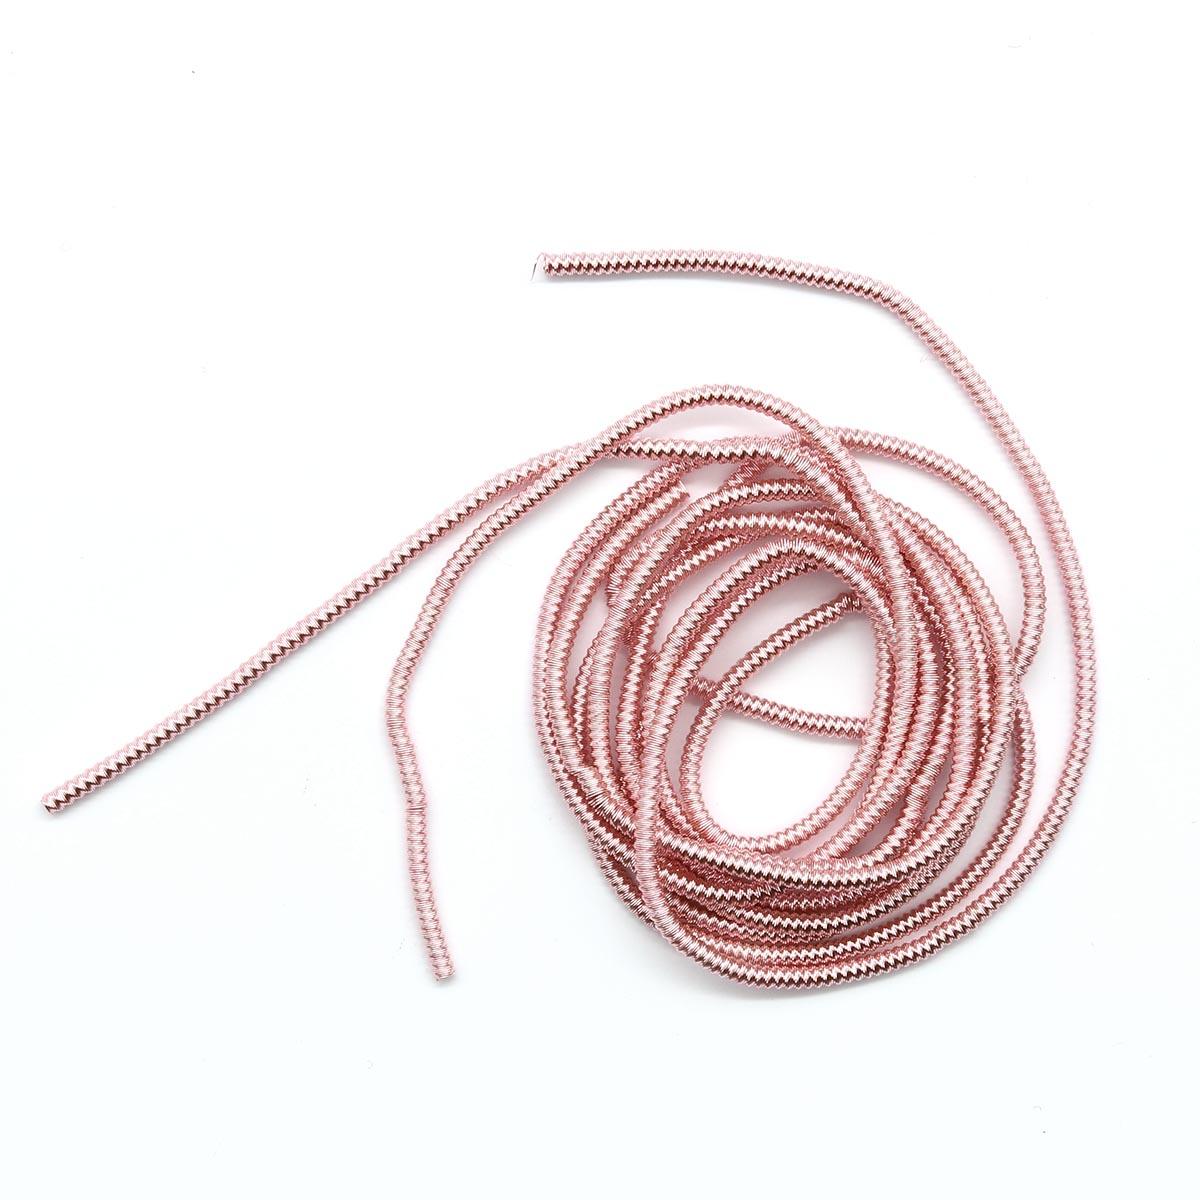 ТЗ008НН1 Трунцал зигзаг Розовый 1,5 мм 5 гр. +/- 0,1 гр.